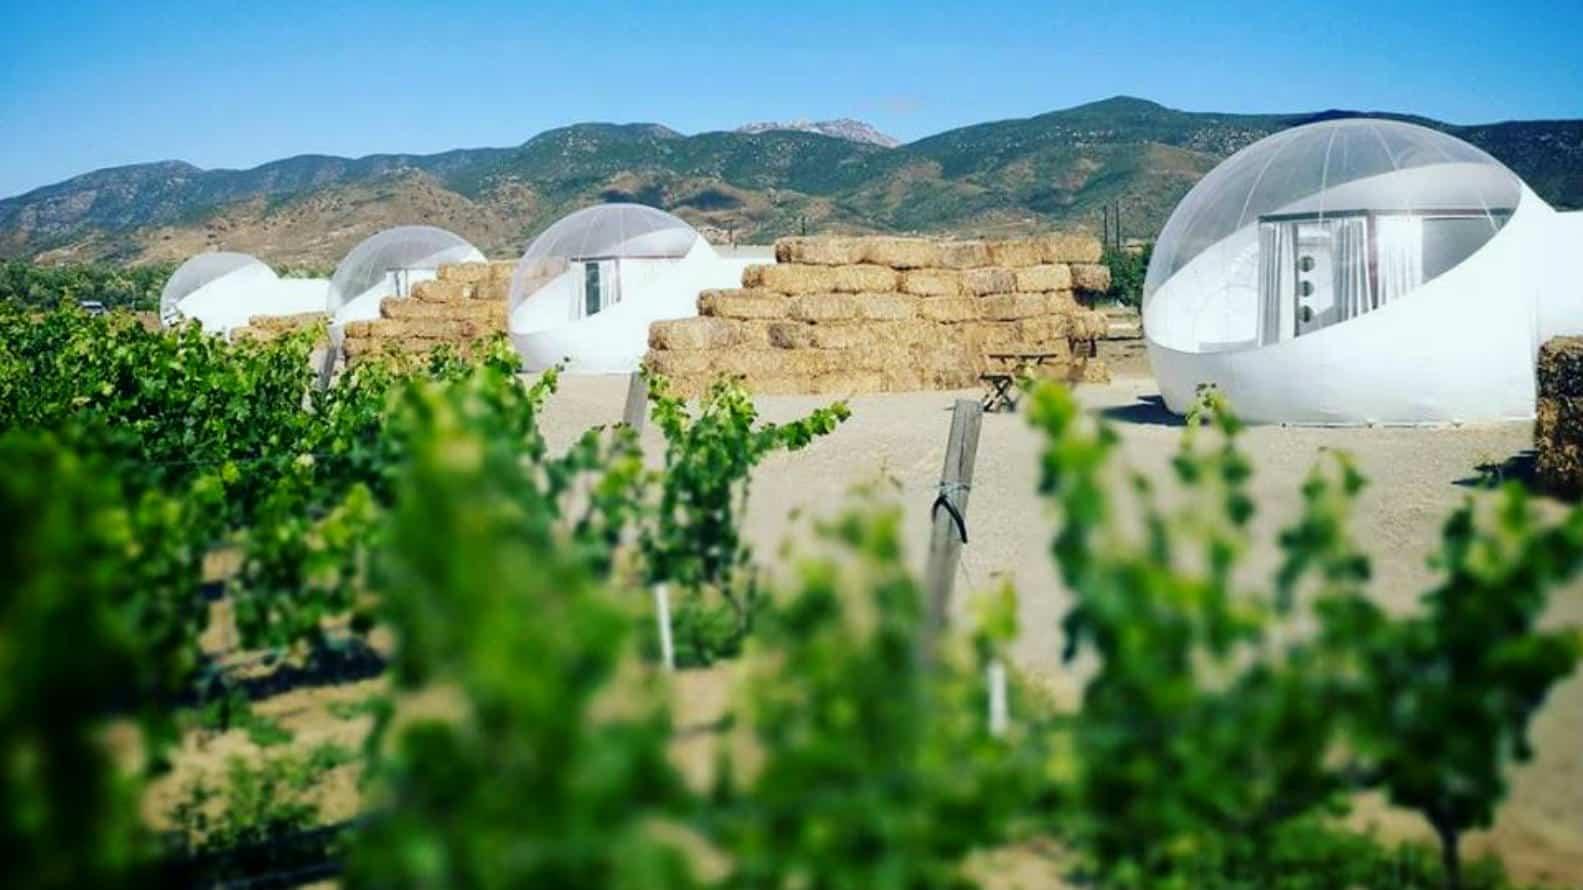 Hoteles Valle de Guadalupe Foto Campera Hotel Burbuja 13